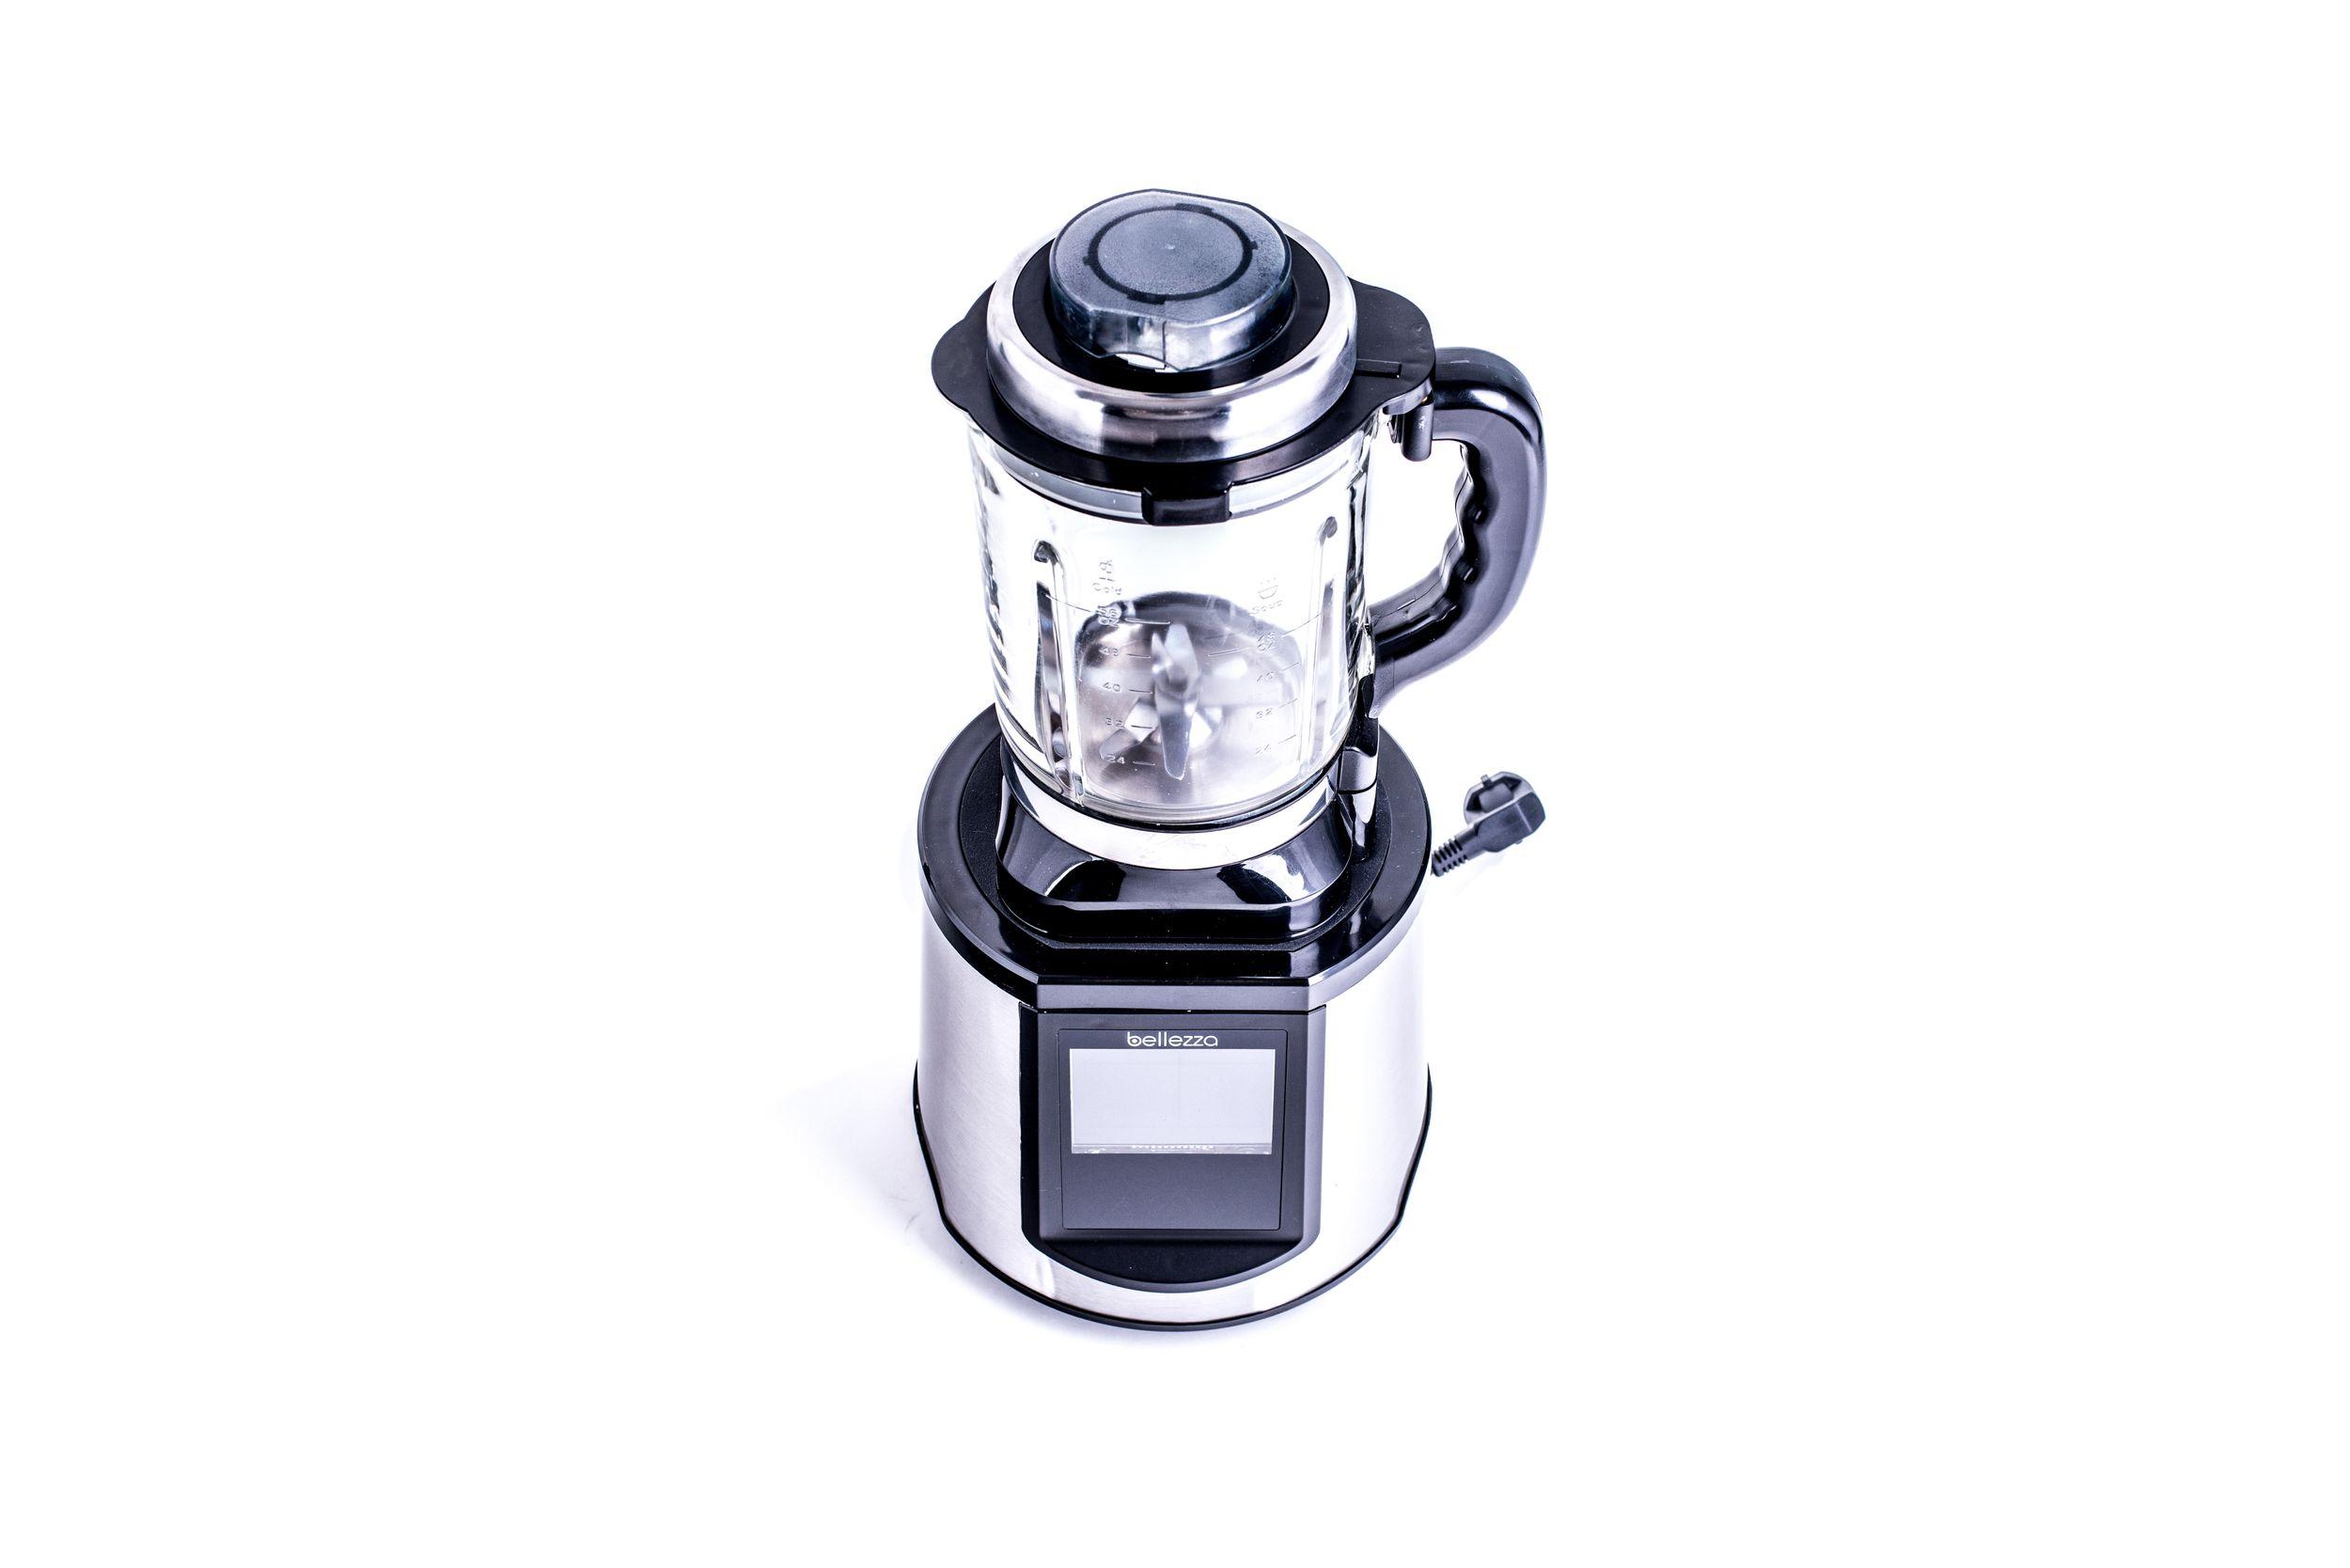 Profistandmixer Kochfunktion Glaskrug Powermixer Blender Cocktailmixer 1,5L !FEHLPRODUKTION!*71563 Bild 2